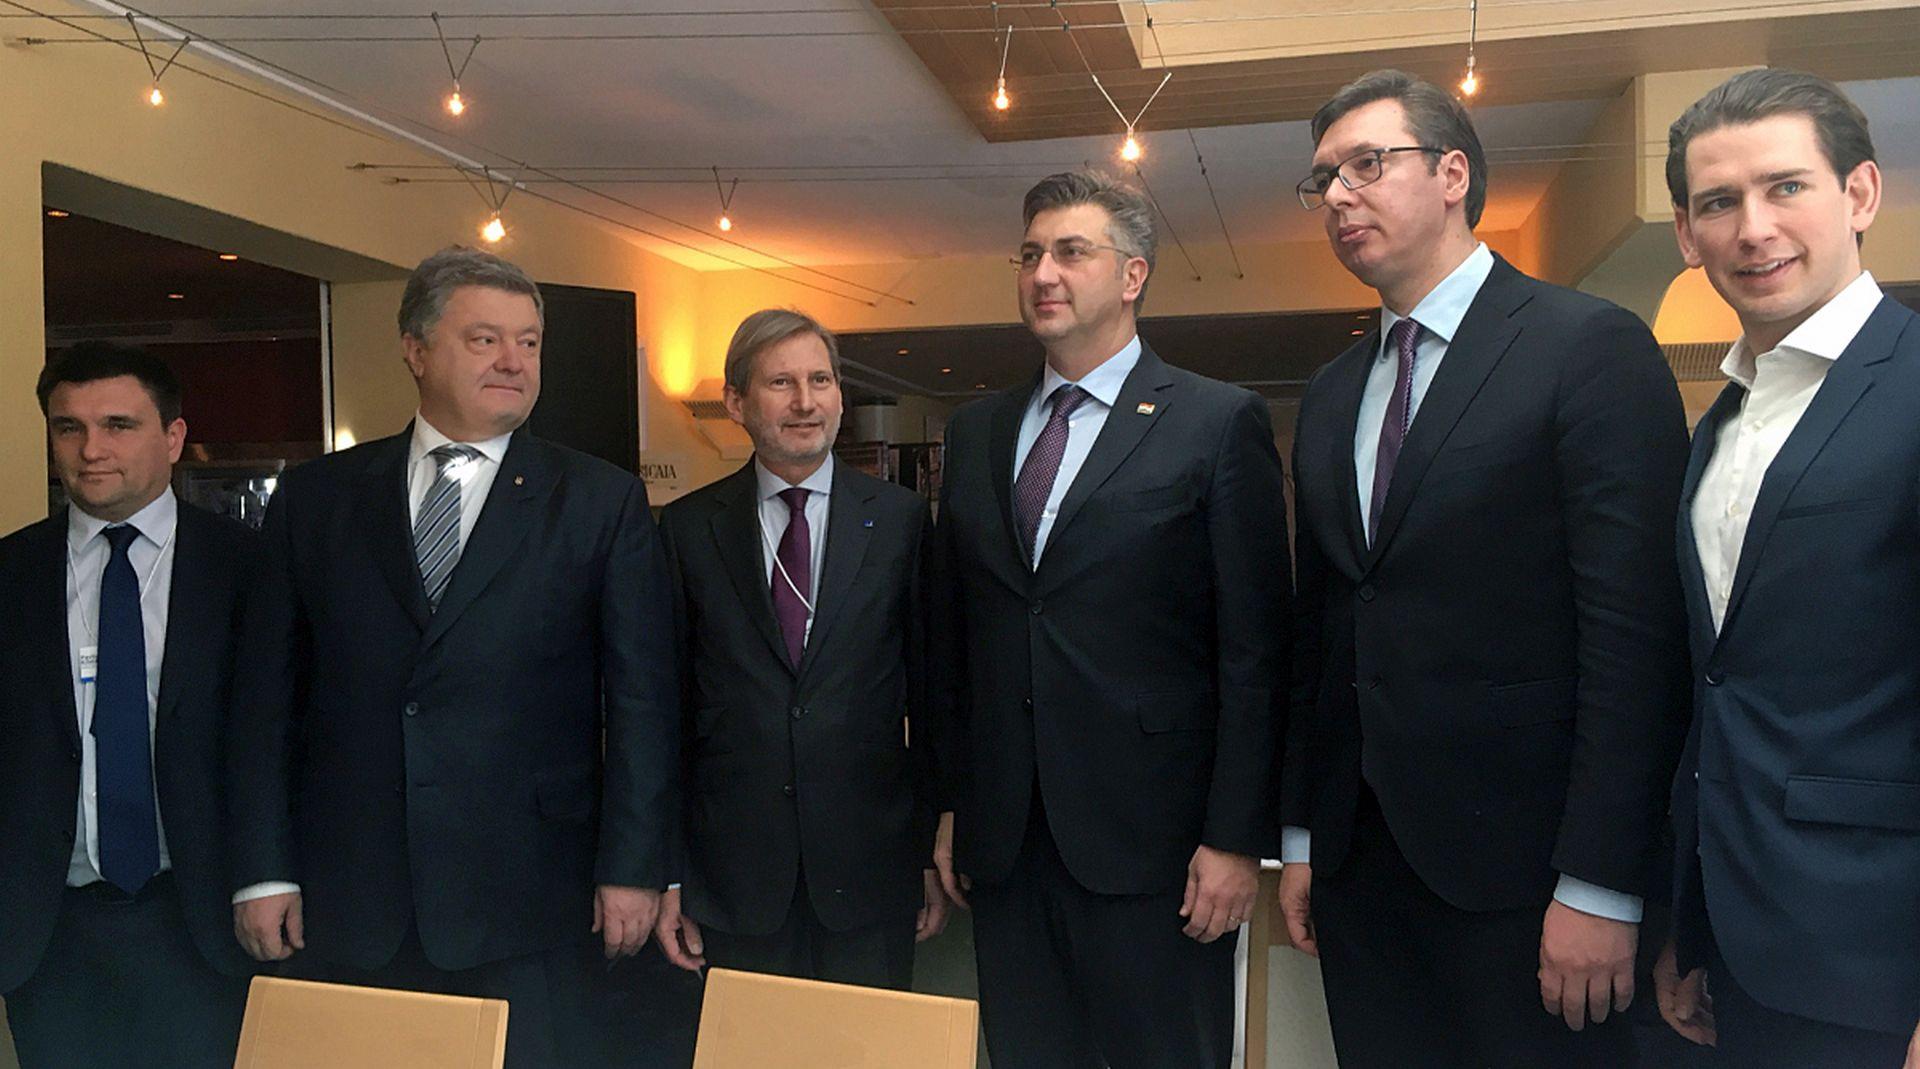 PLENKOVIĆ U DAVOSU Borbeni zrakoplov, Vučić, booking.com, google, La Roche, Trump…